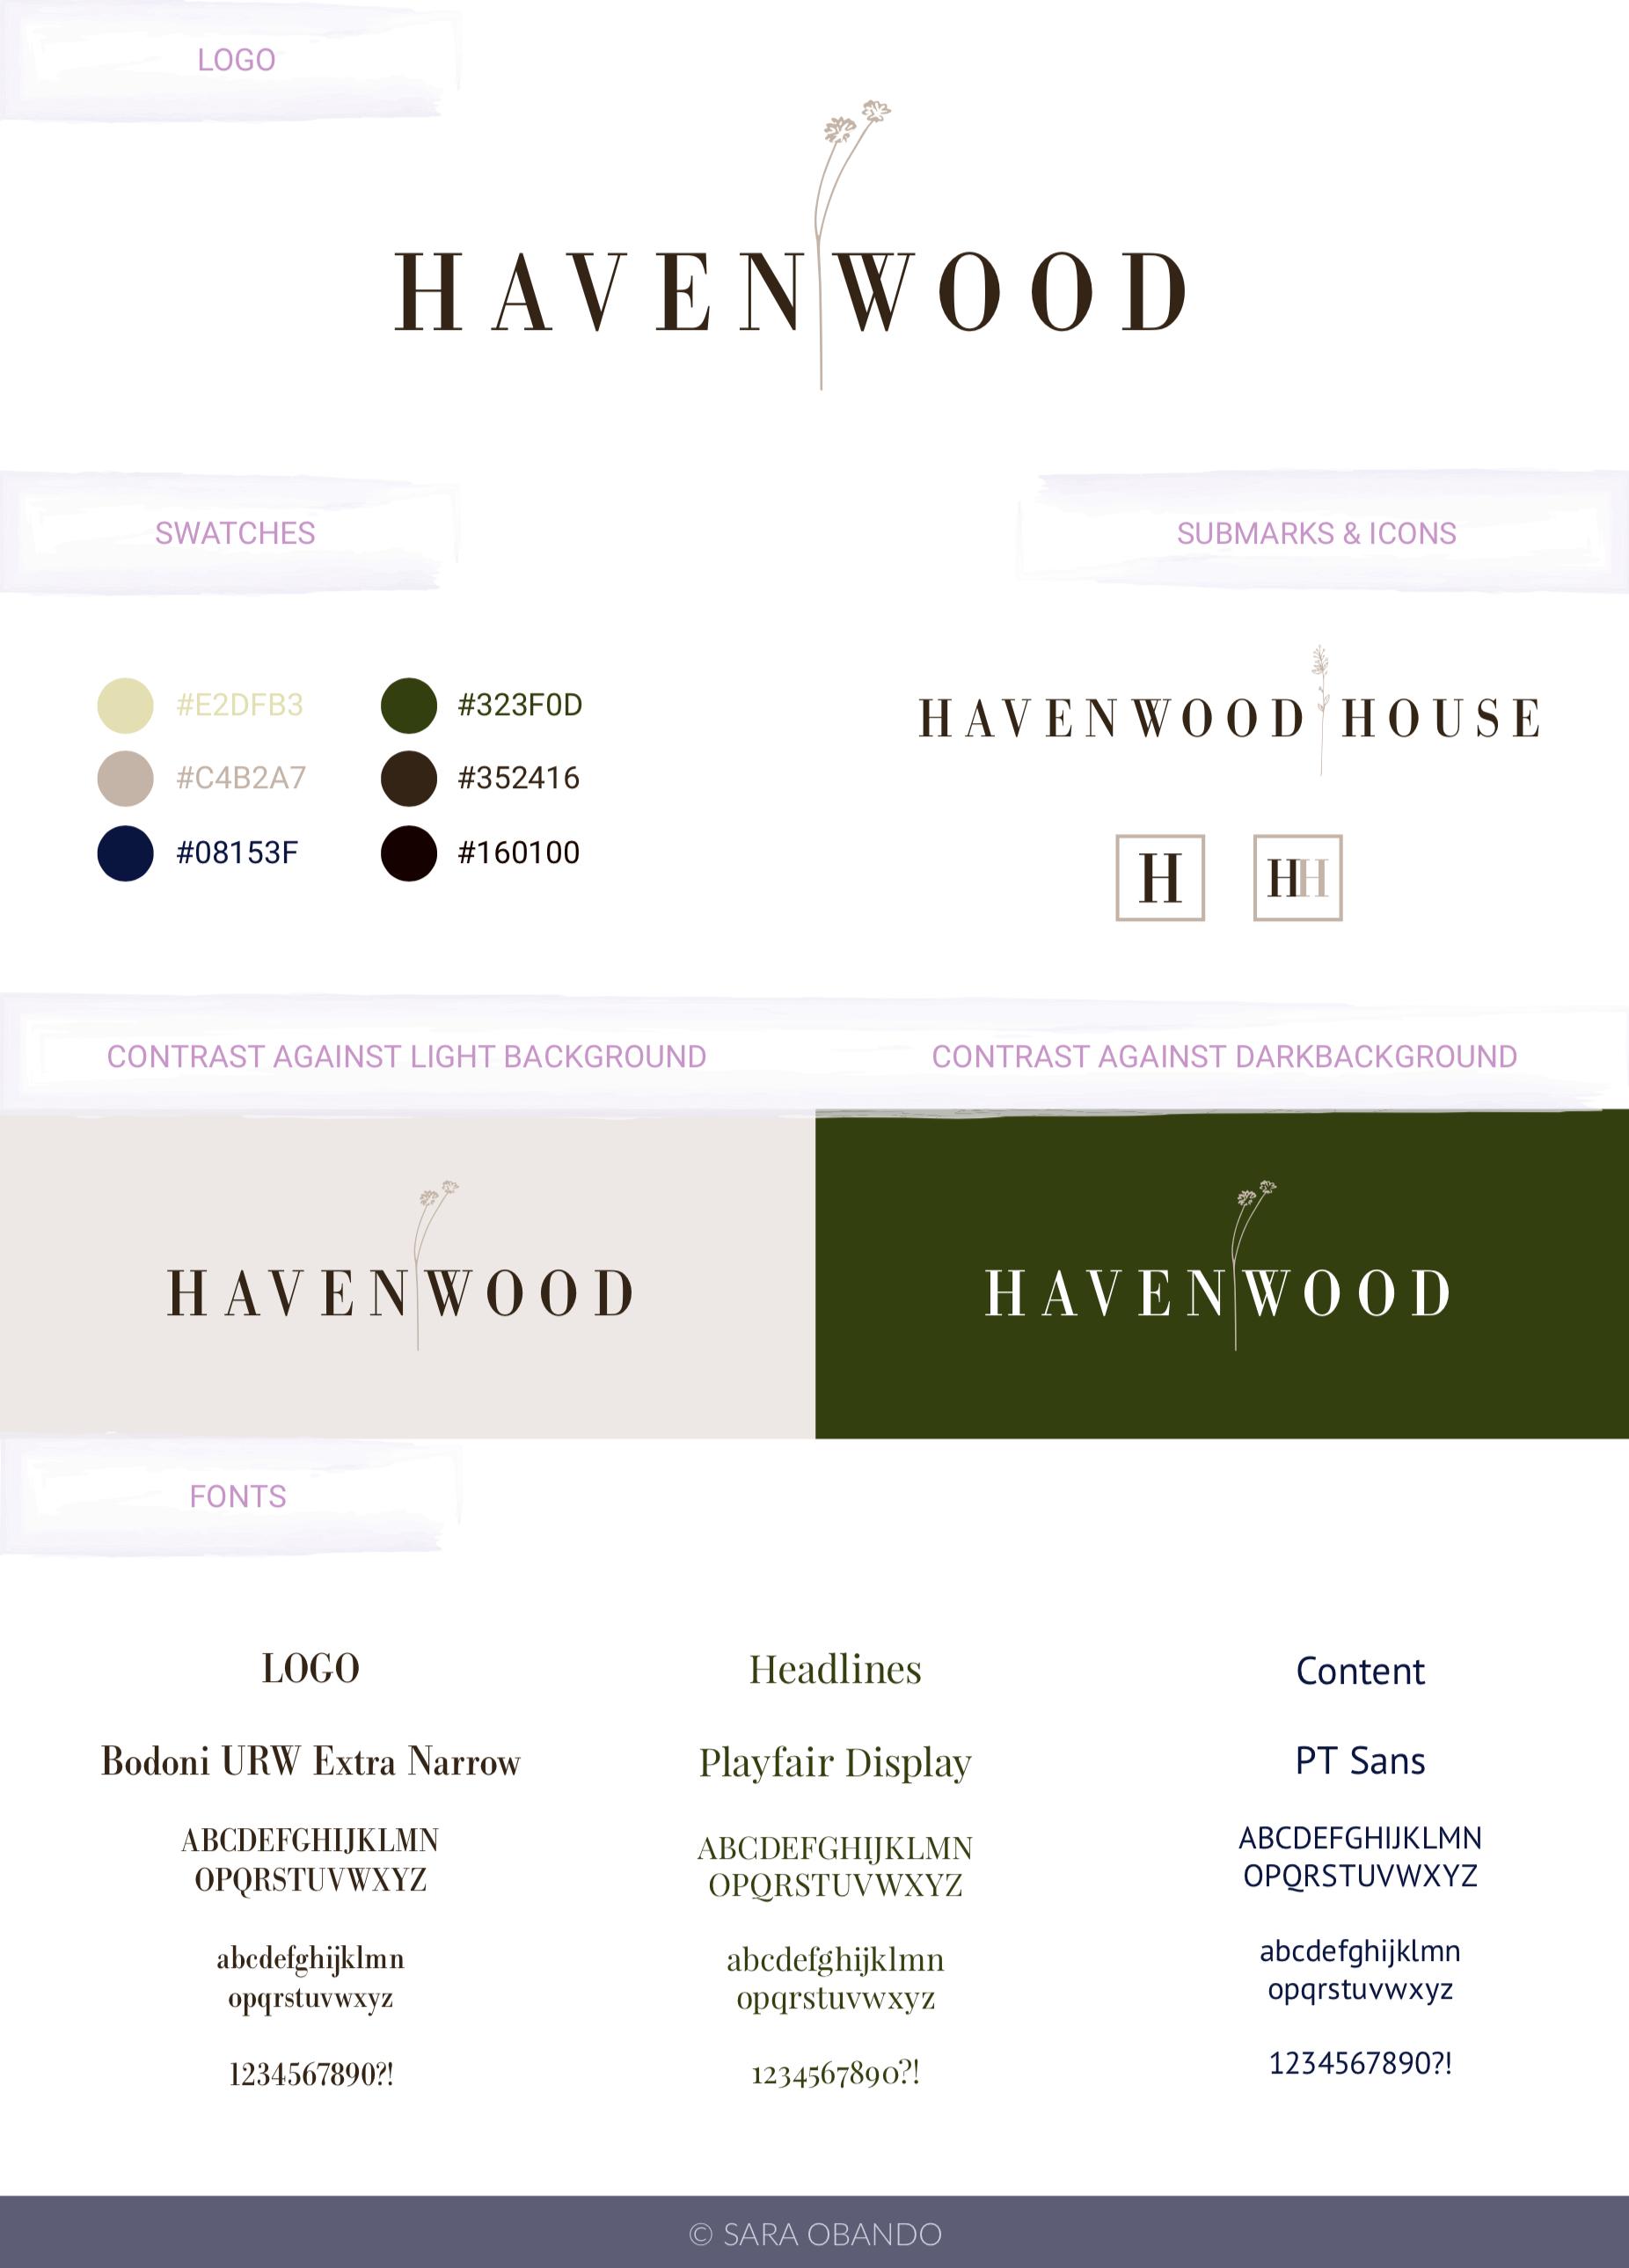 Havenwood Brandboard